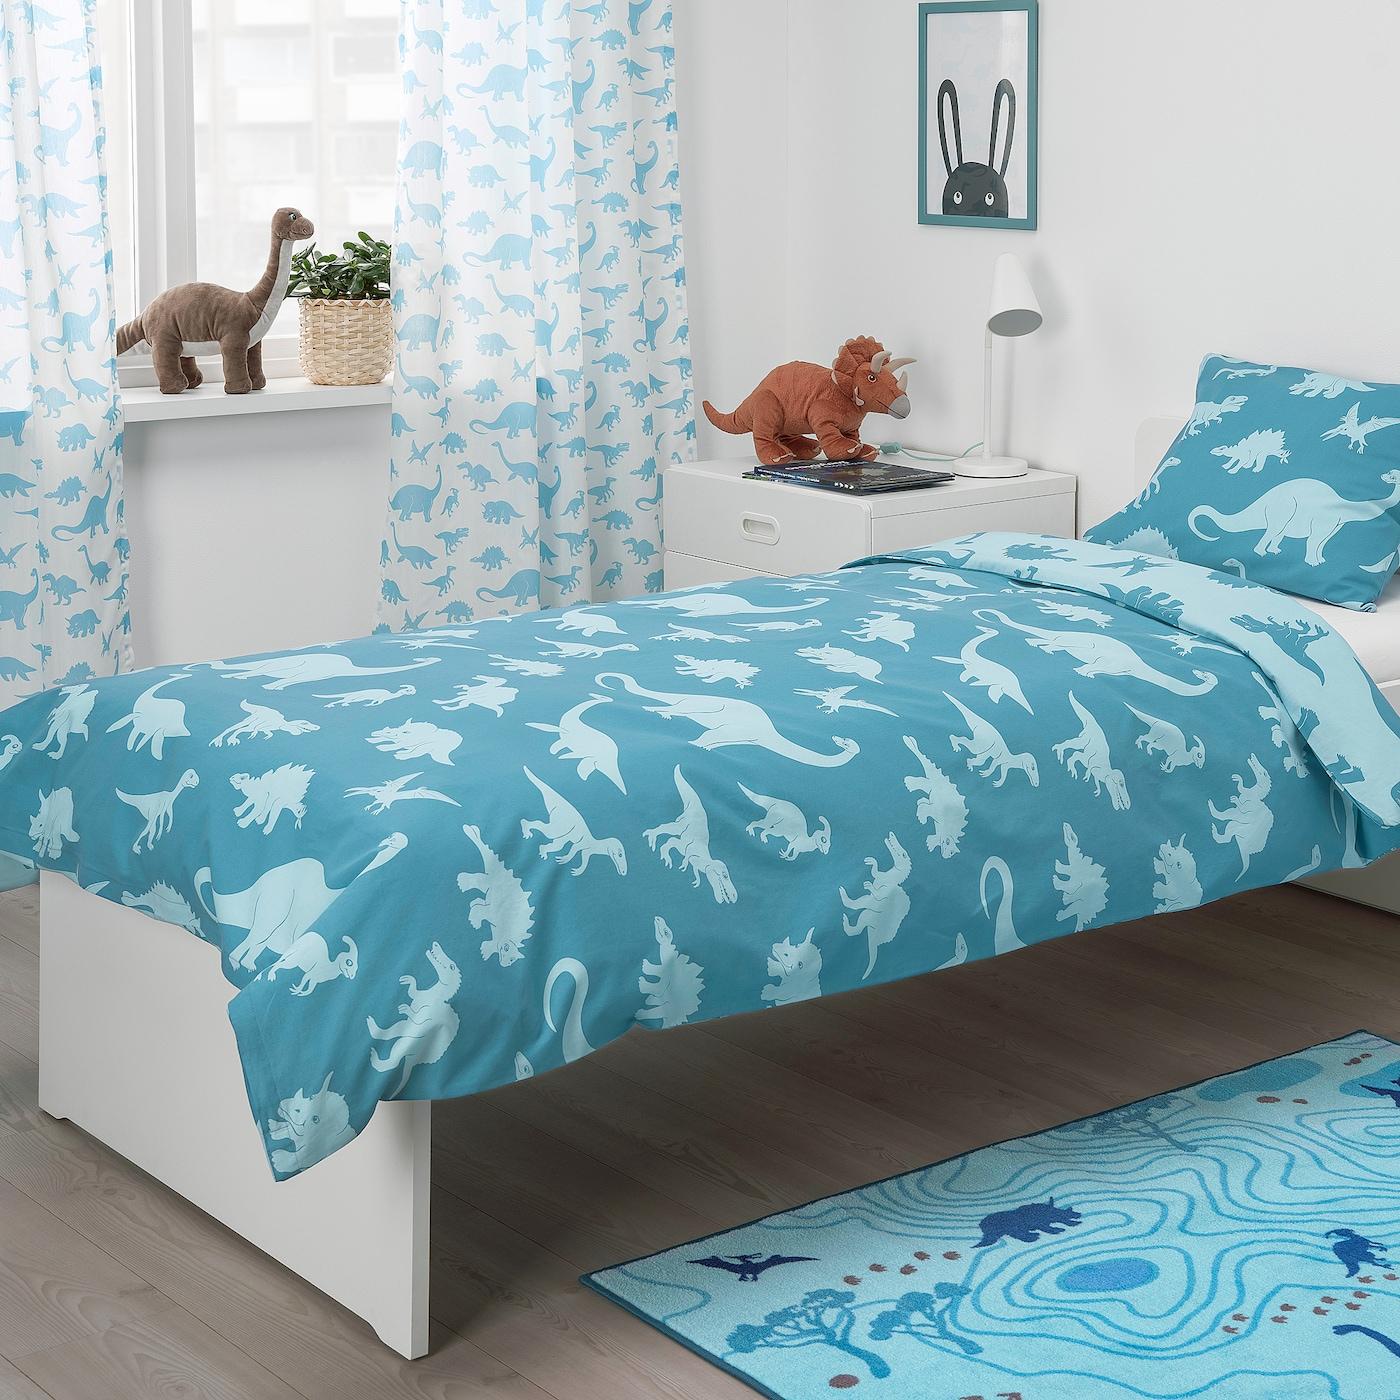 JÄTTELIK Duvet cover and pillowcase, dinosaur/blue, 150x200/50x80 cm